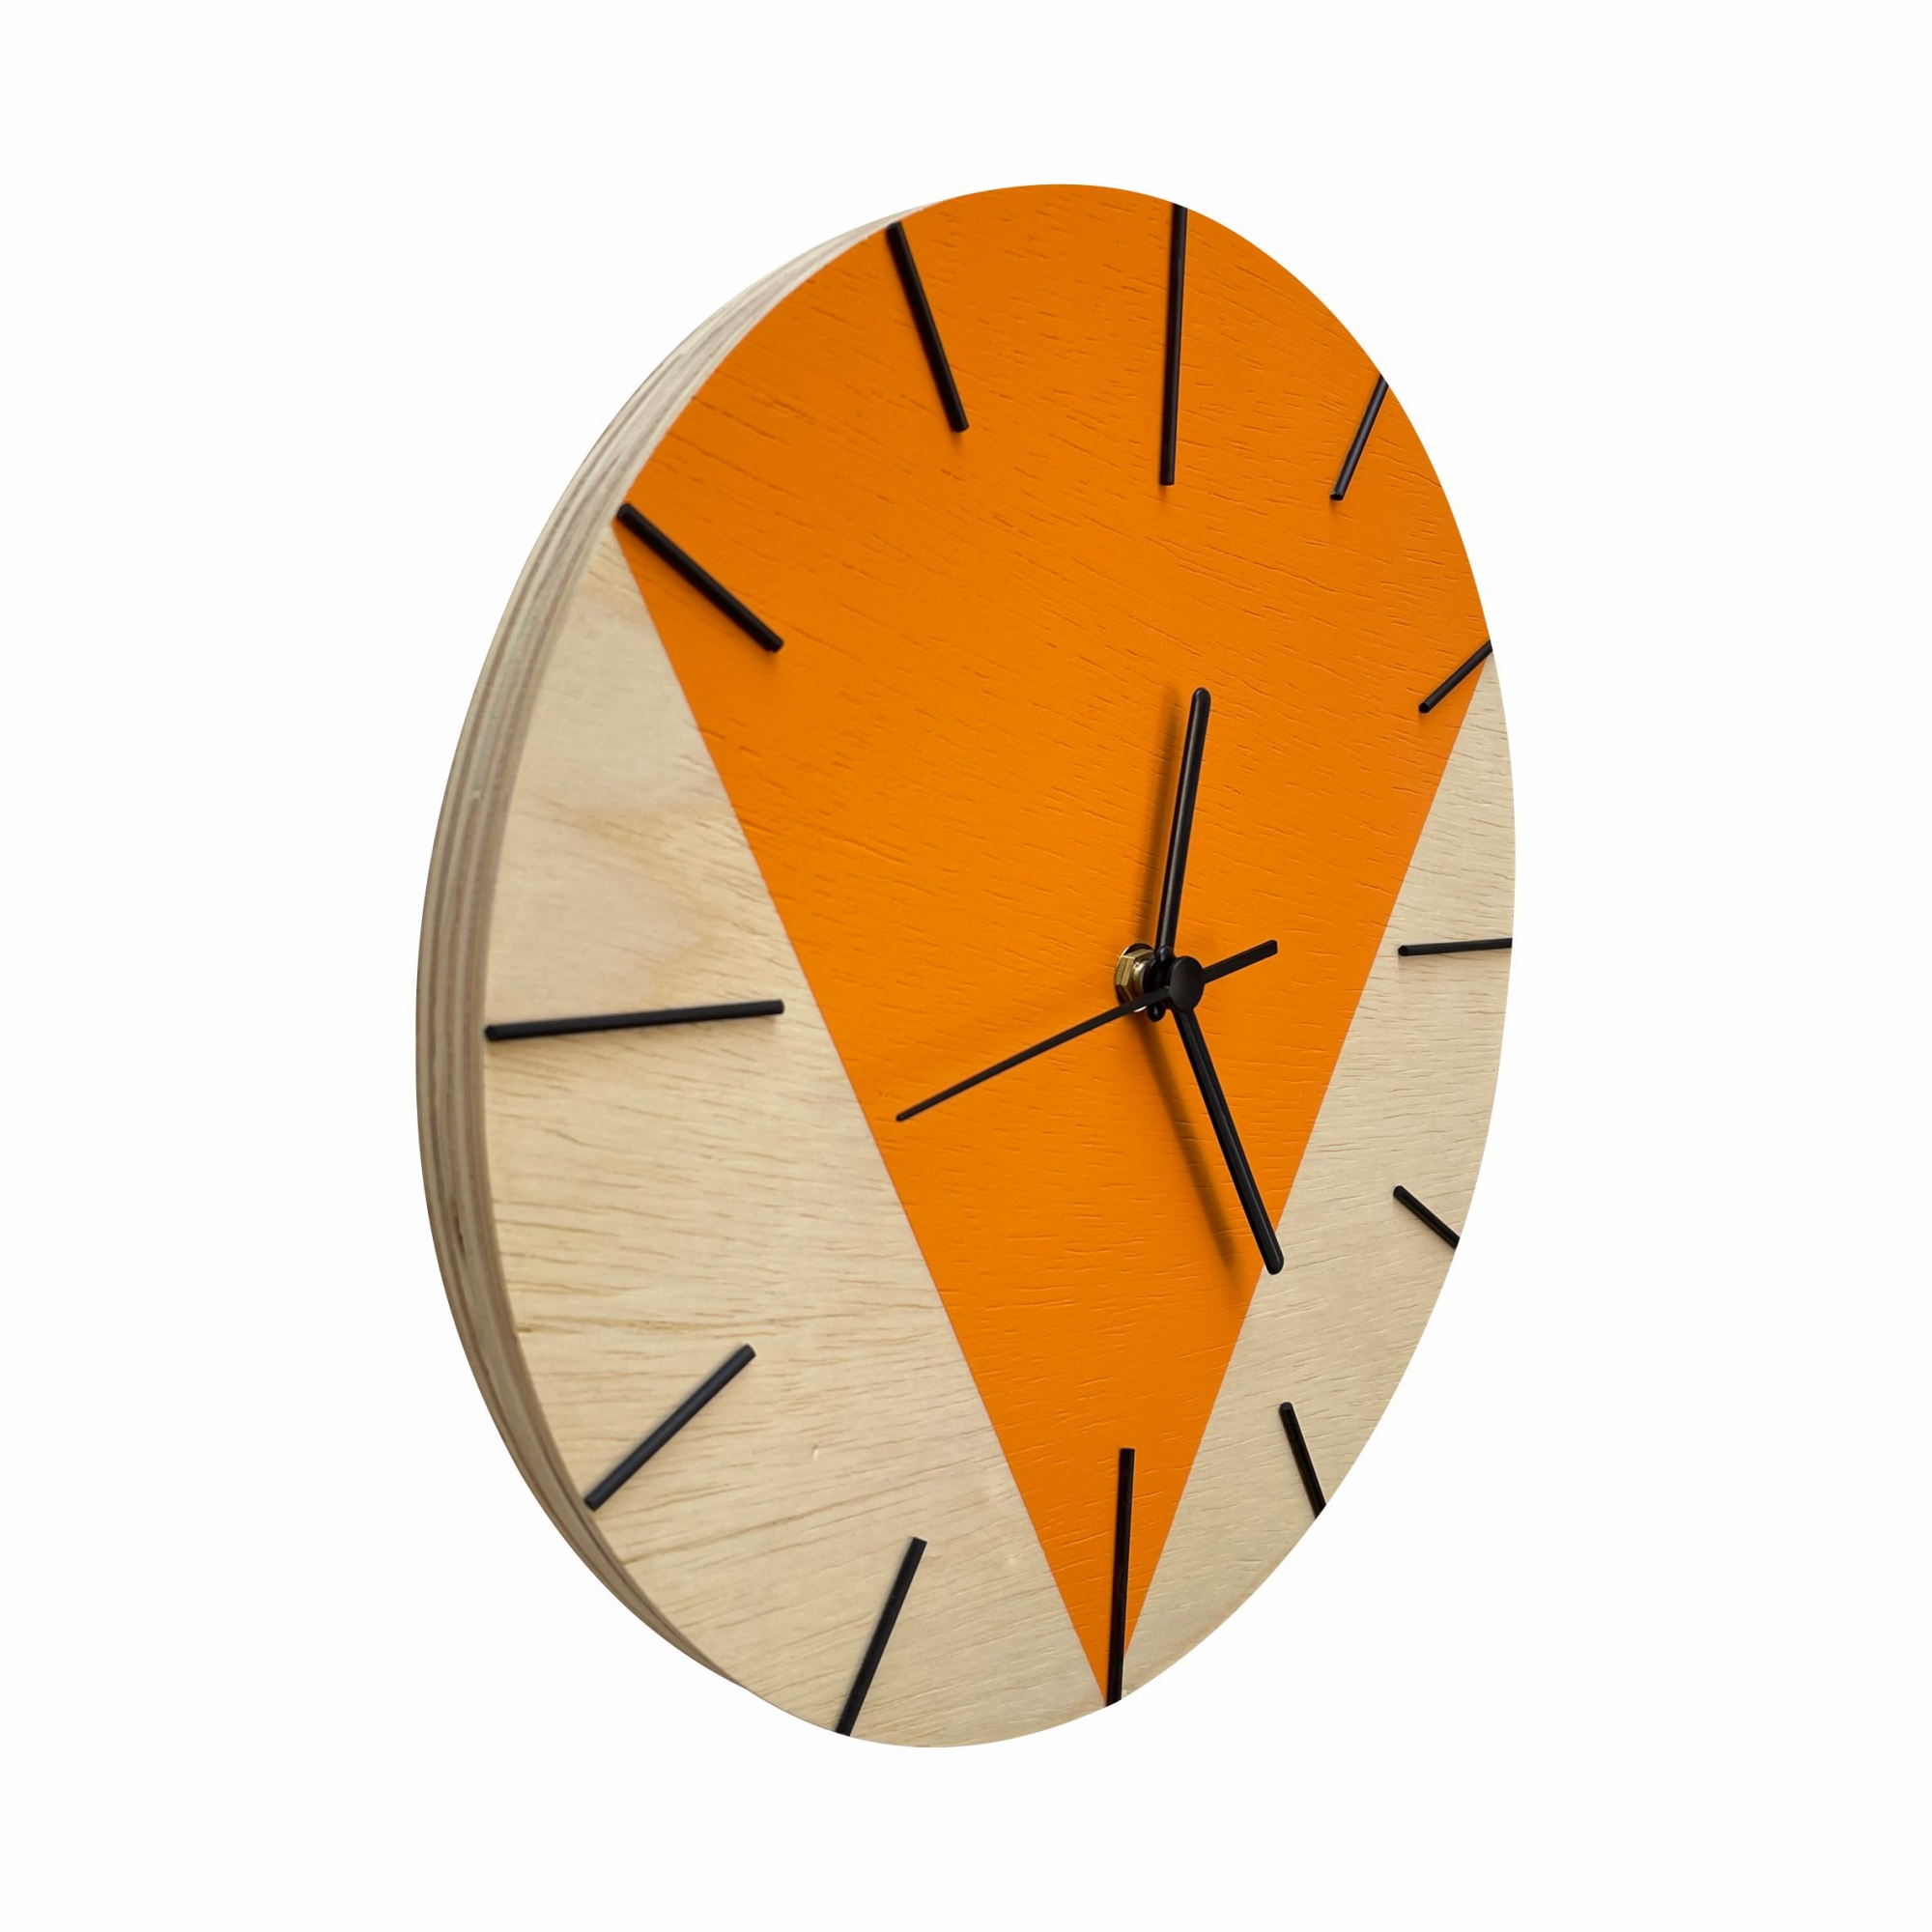 Relógio de Parede Design Triangular - 30cm Tangerine